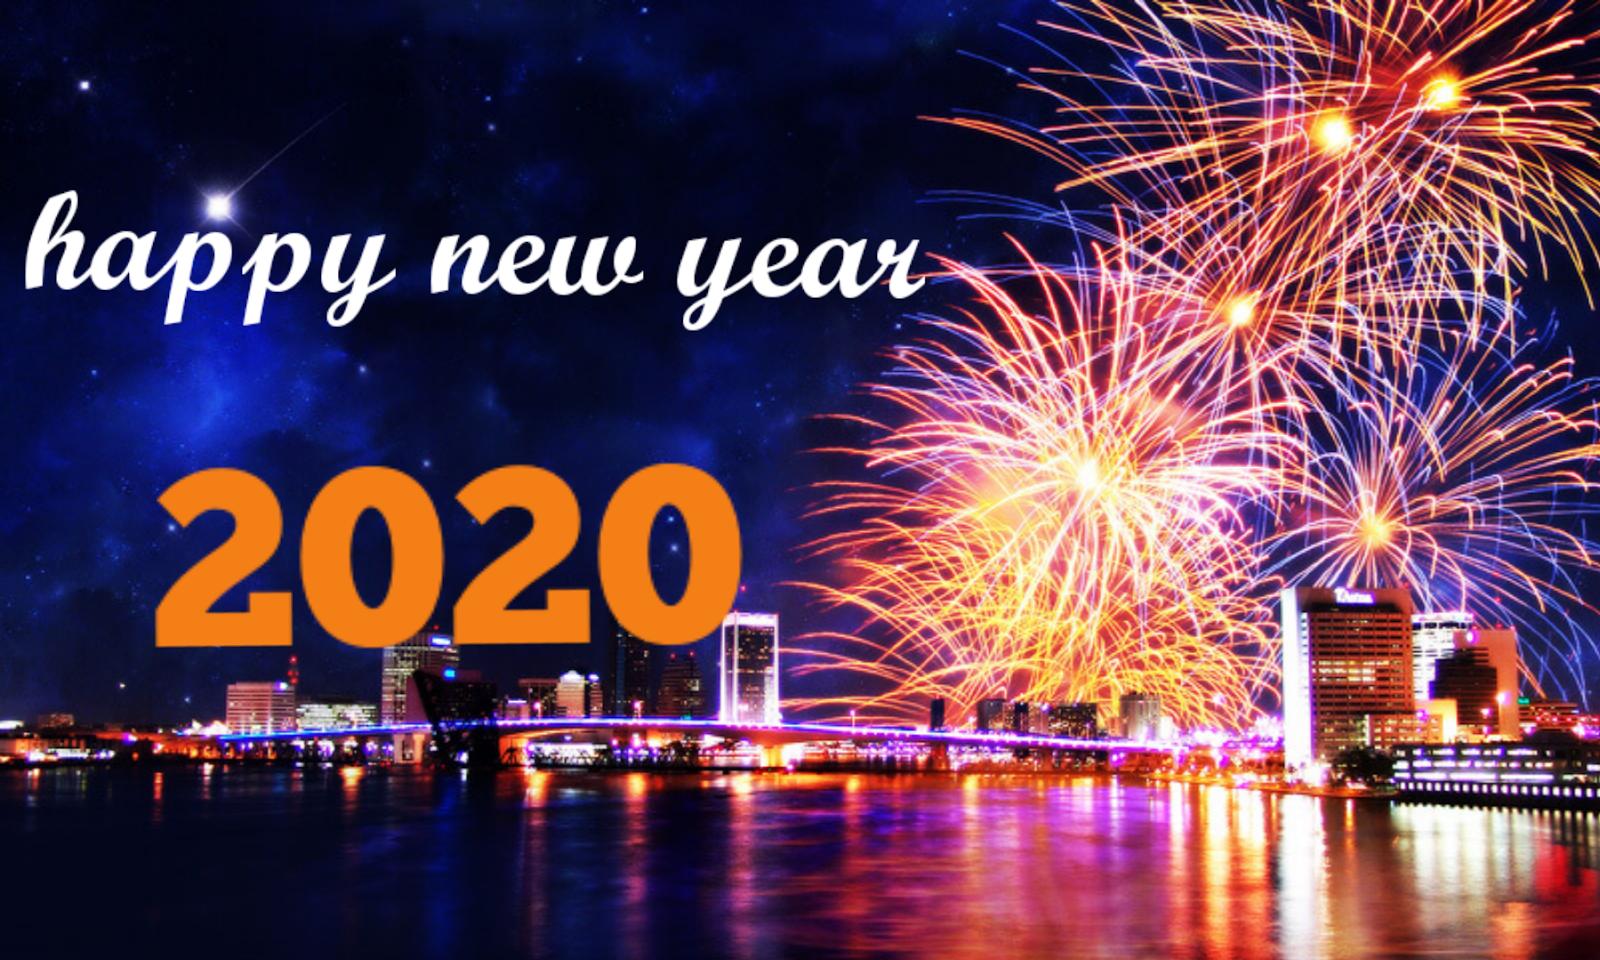 happy new year 2020,Happy new year msg, wishes - Happy-New